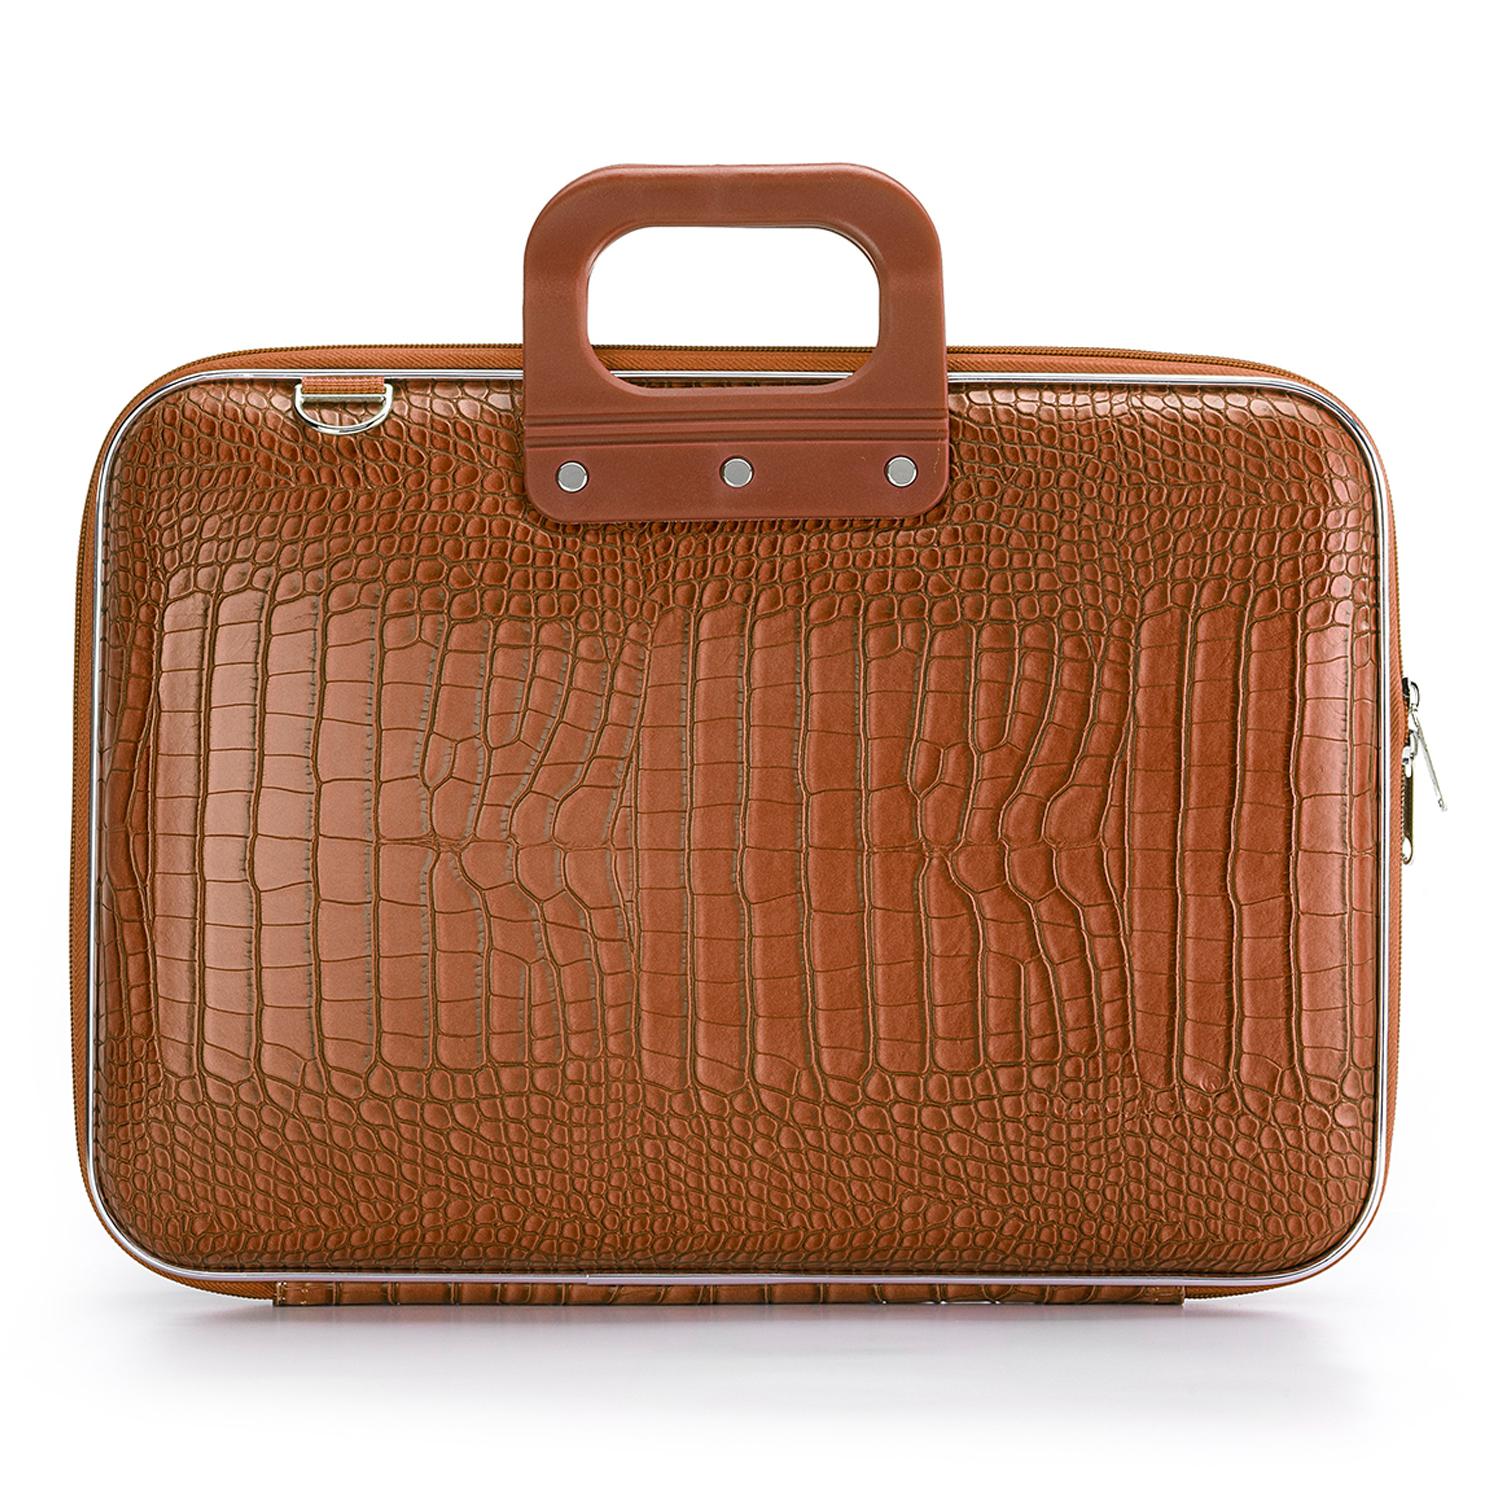 Bombata – Terracotta Brown Cocco 15″ Laptop Case/Bag with Shoulder Strap